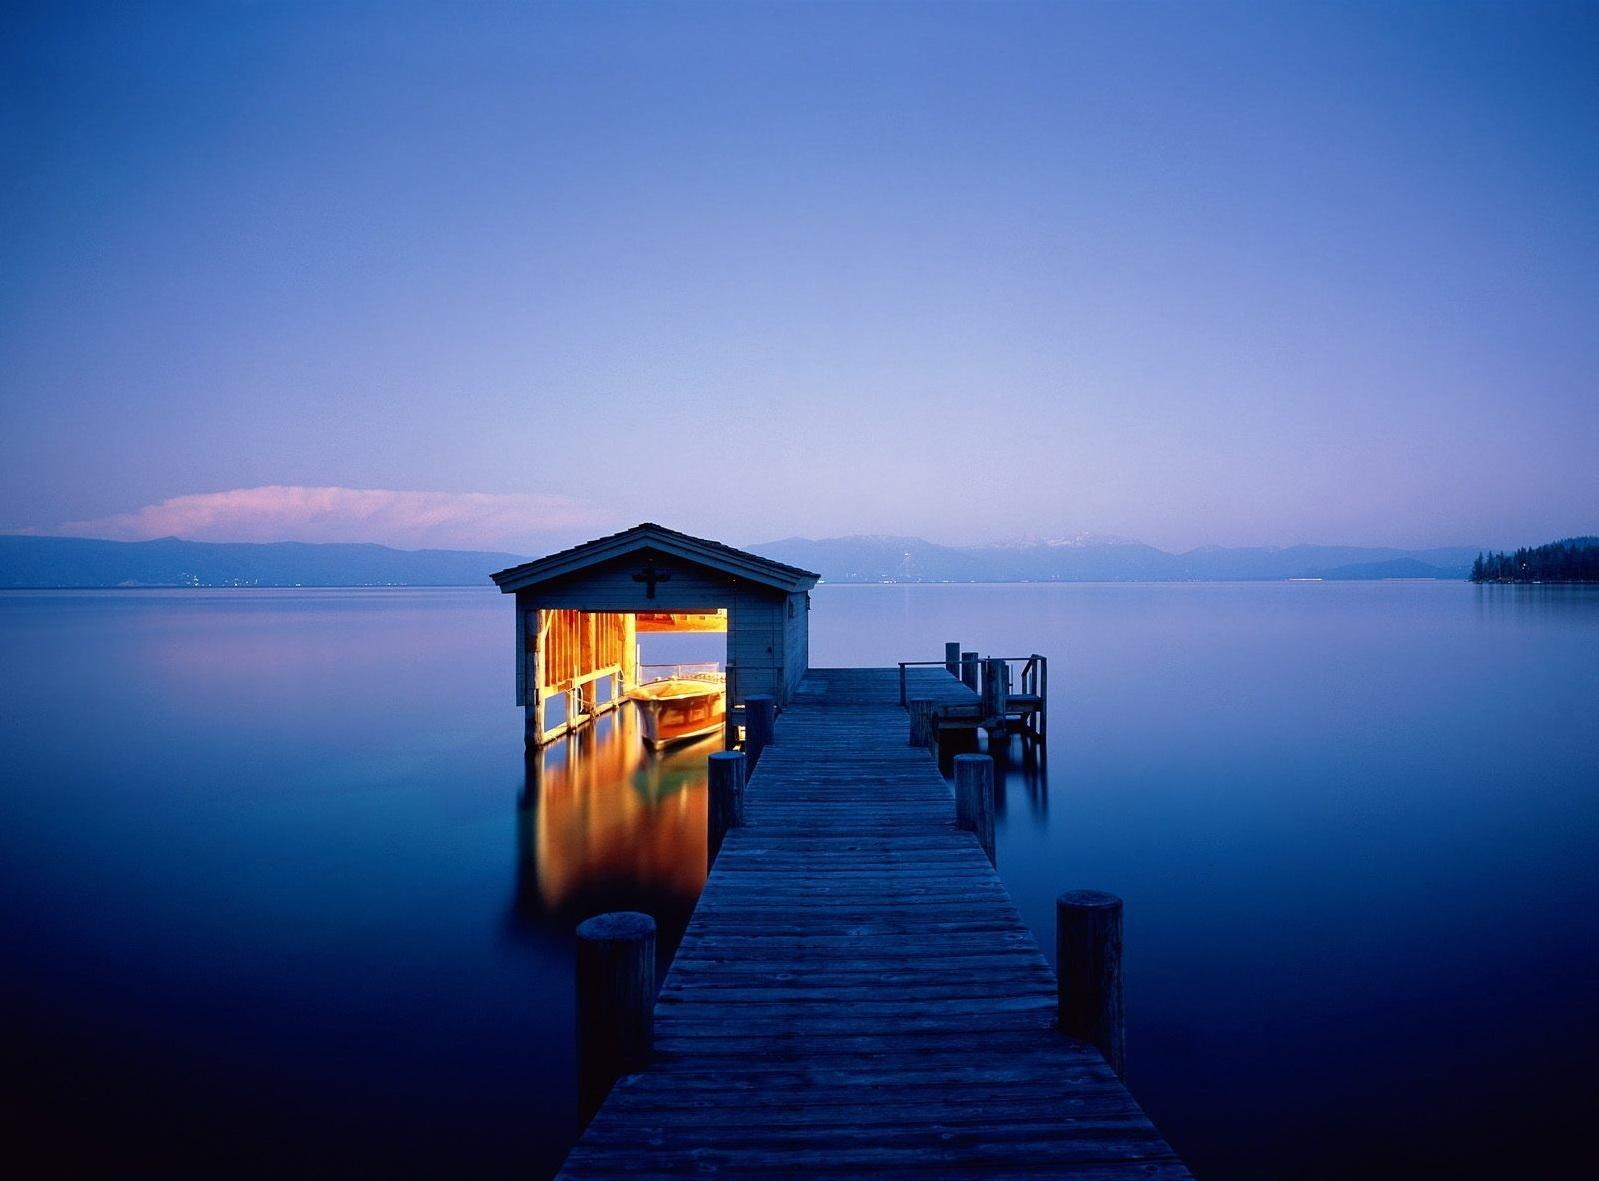 Hintergrundbilder : Seebrücke, Nacht-, Boot, Beleuchtung, Festmachen ...